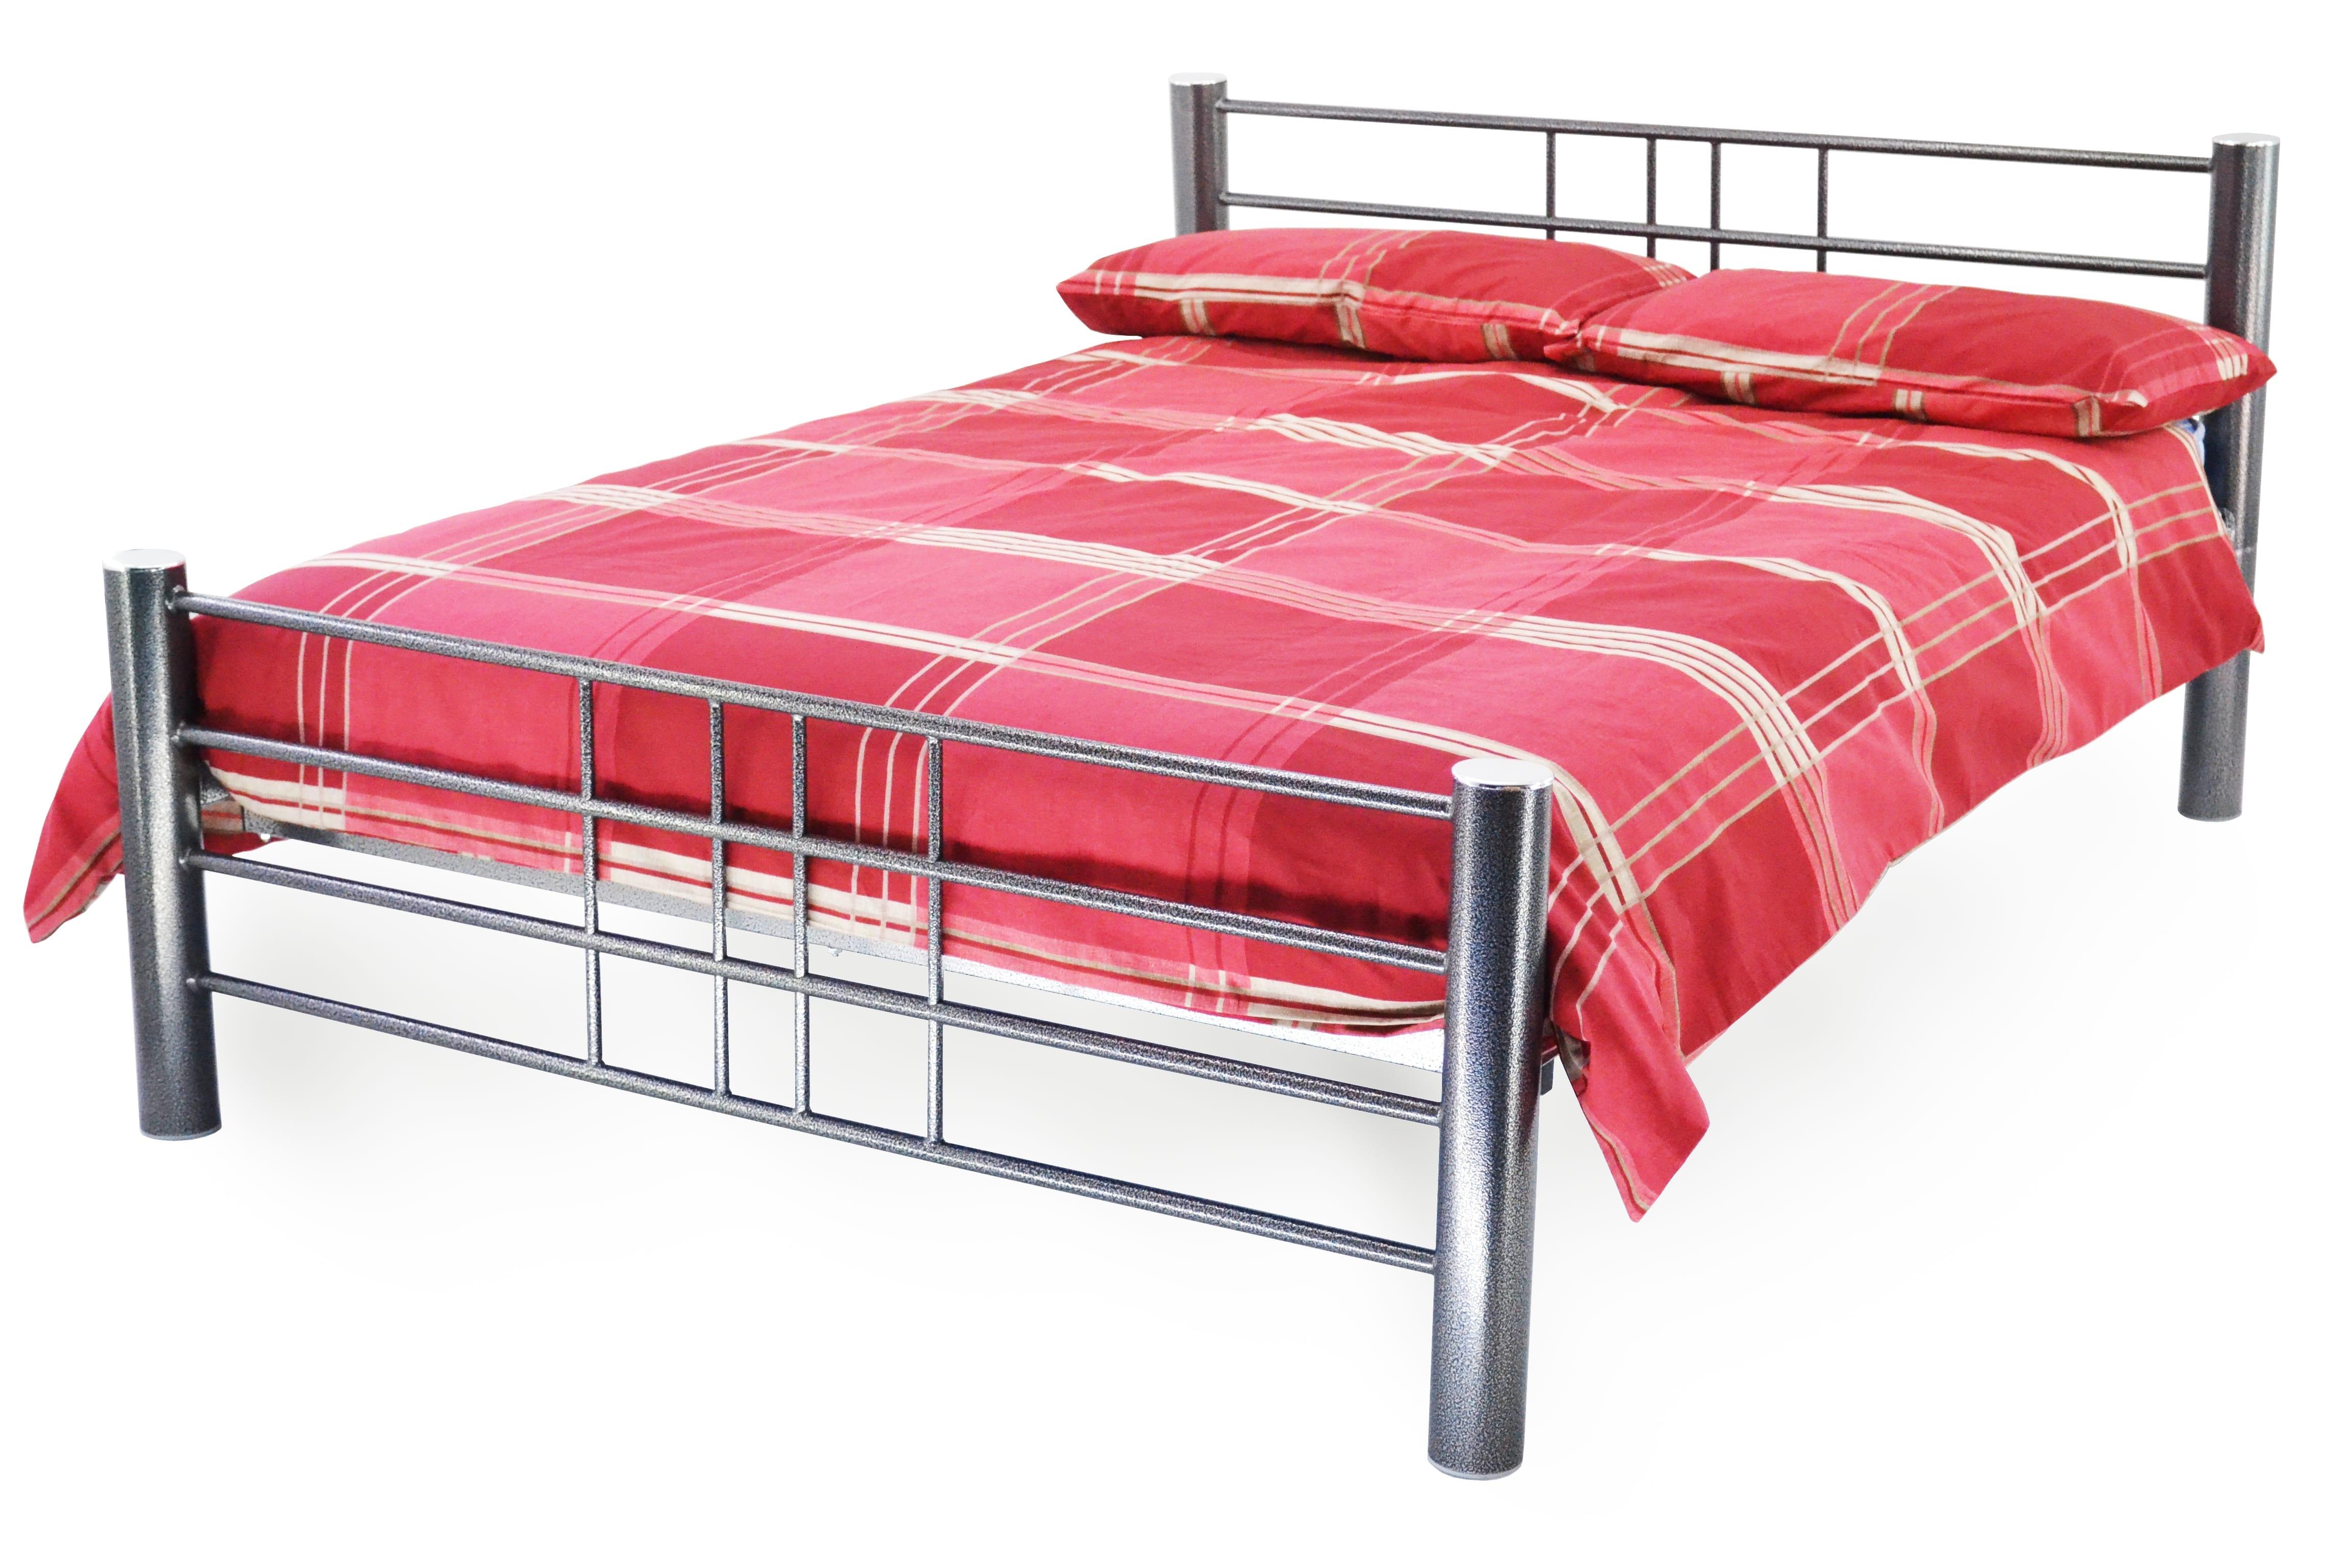 cuba metal bed frame silver hammered - Silver Metal Bed Frame